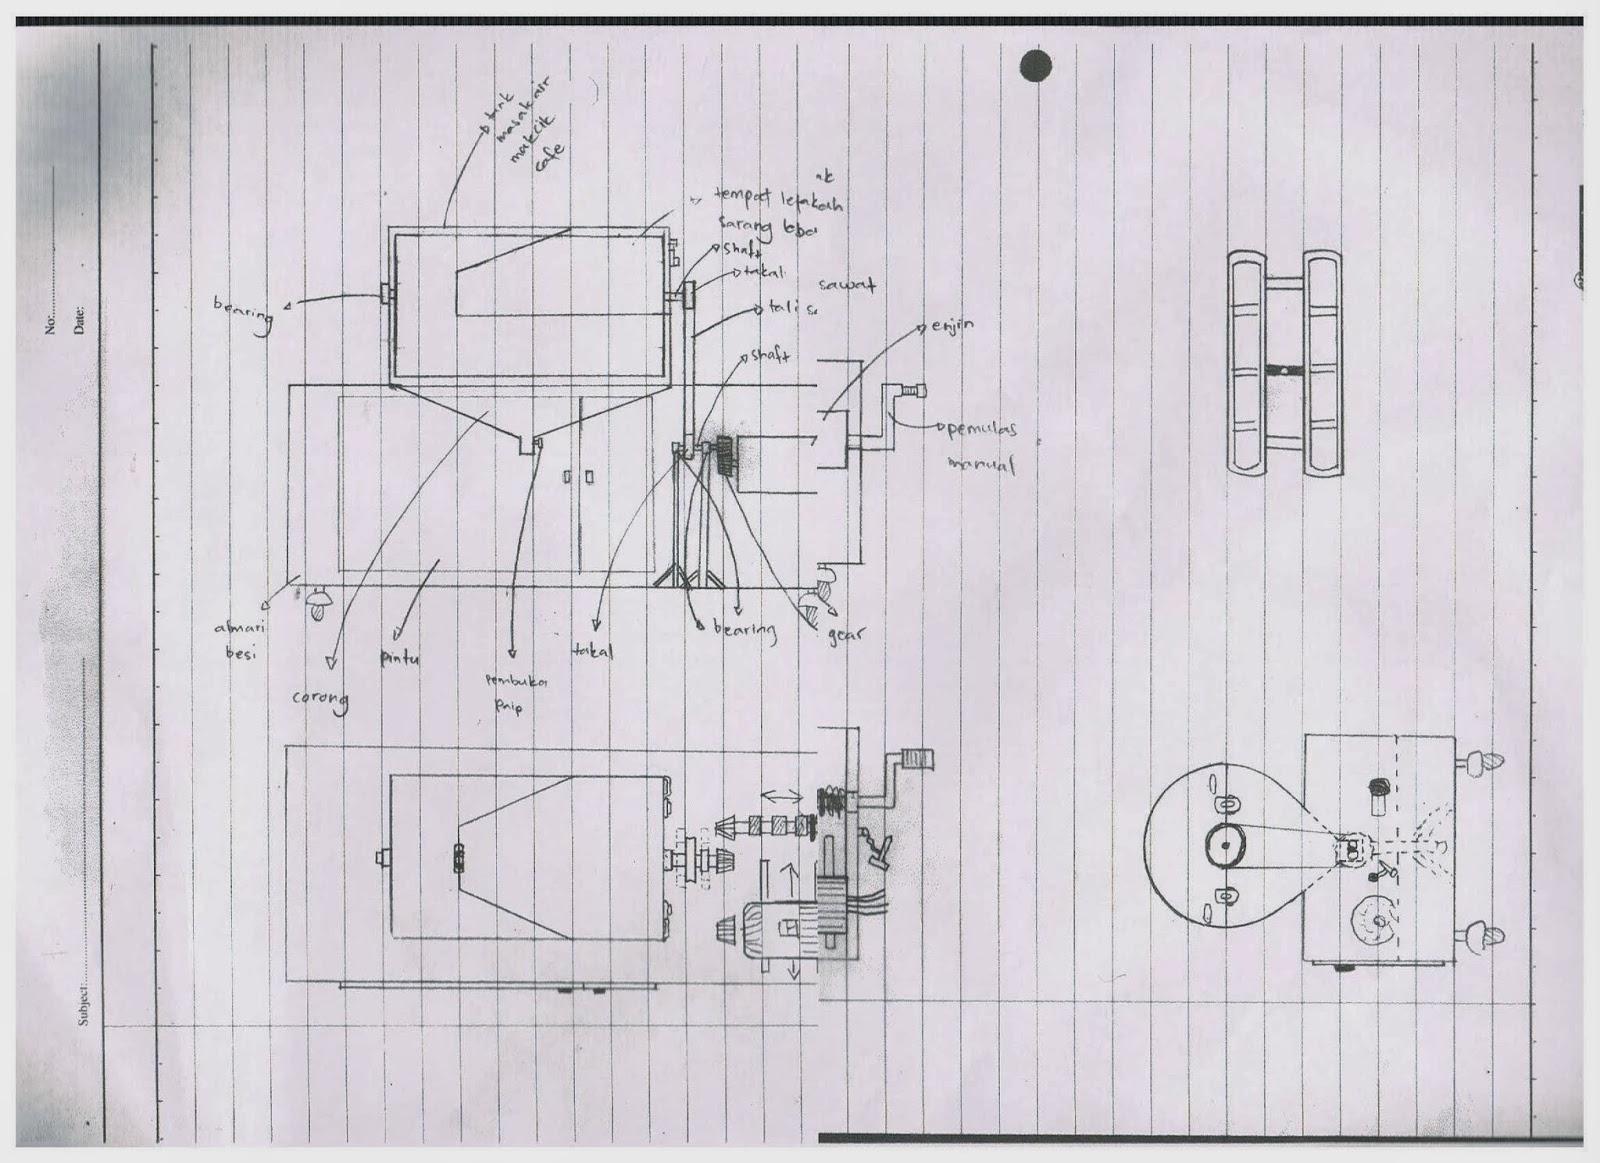 Its About Me Projek Akhir Diploma Kejuruteraan Mekanikal Automatic Honey Extractor Machine A H E